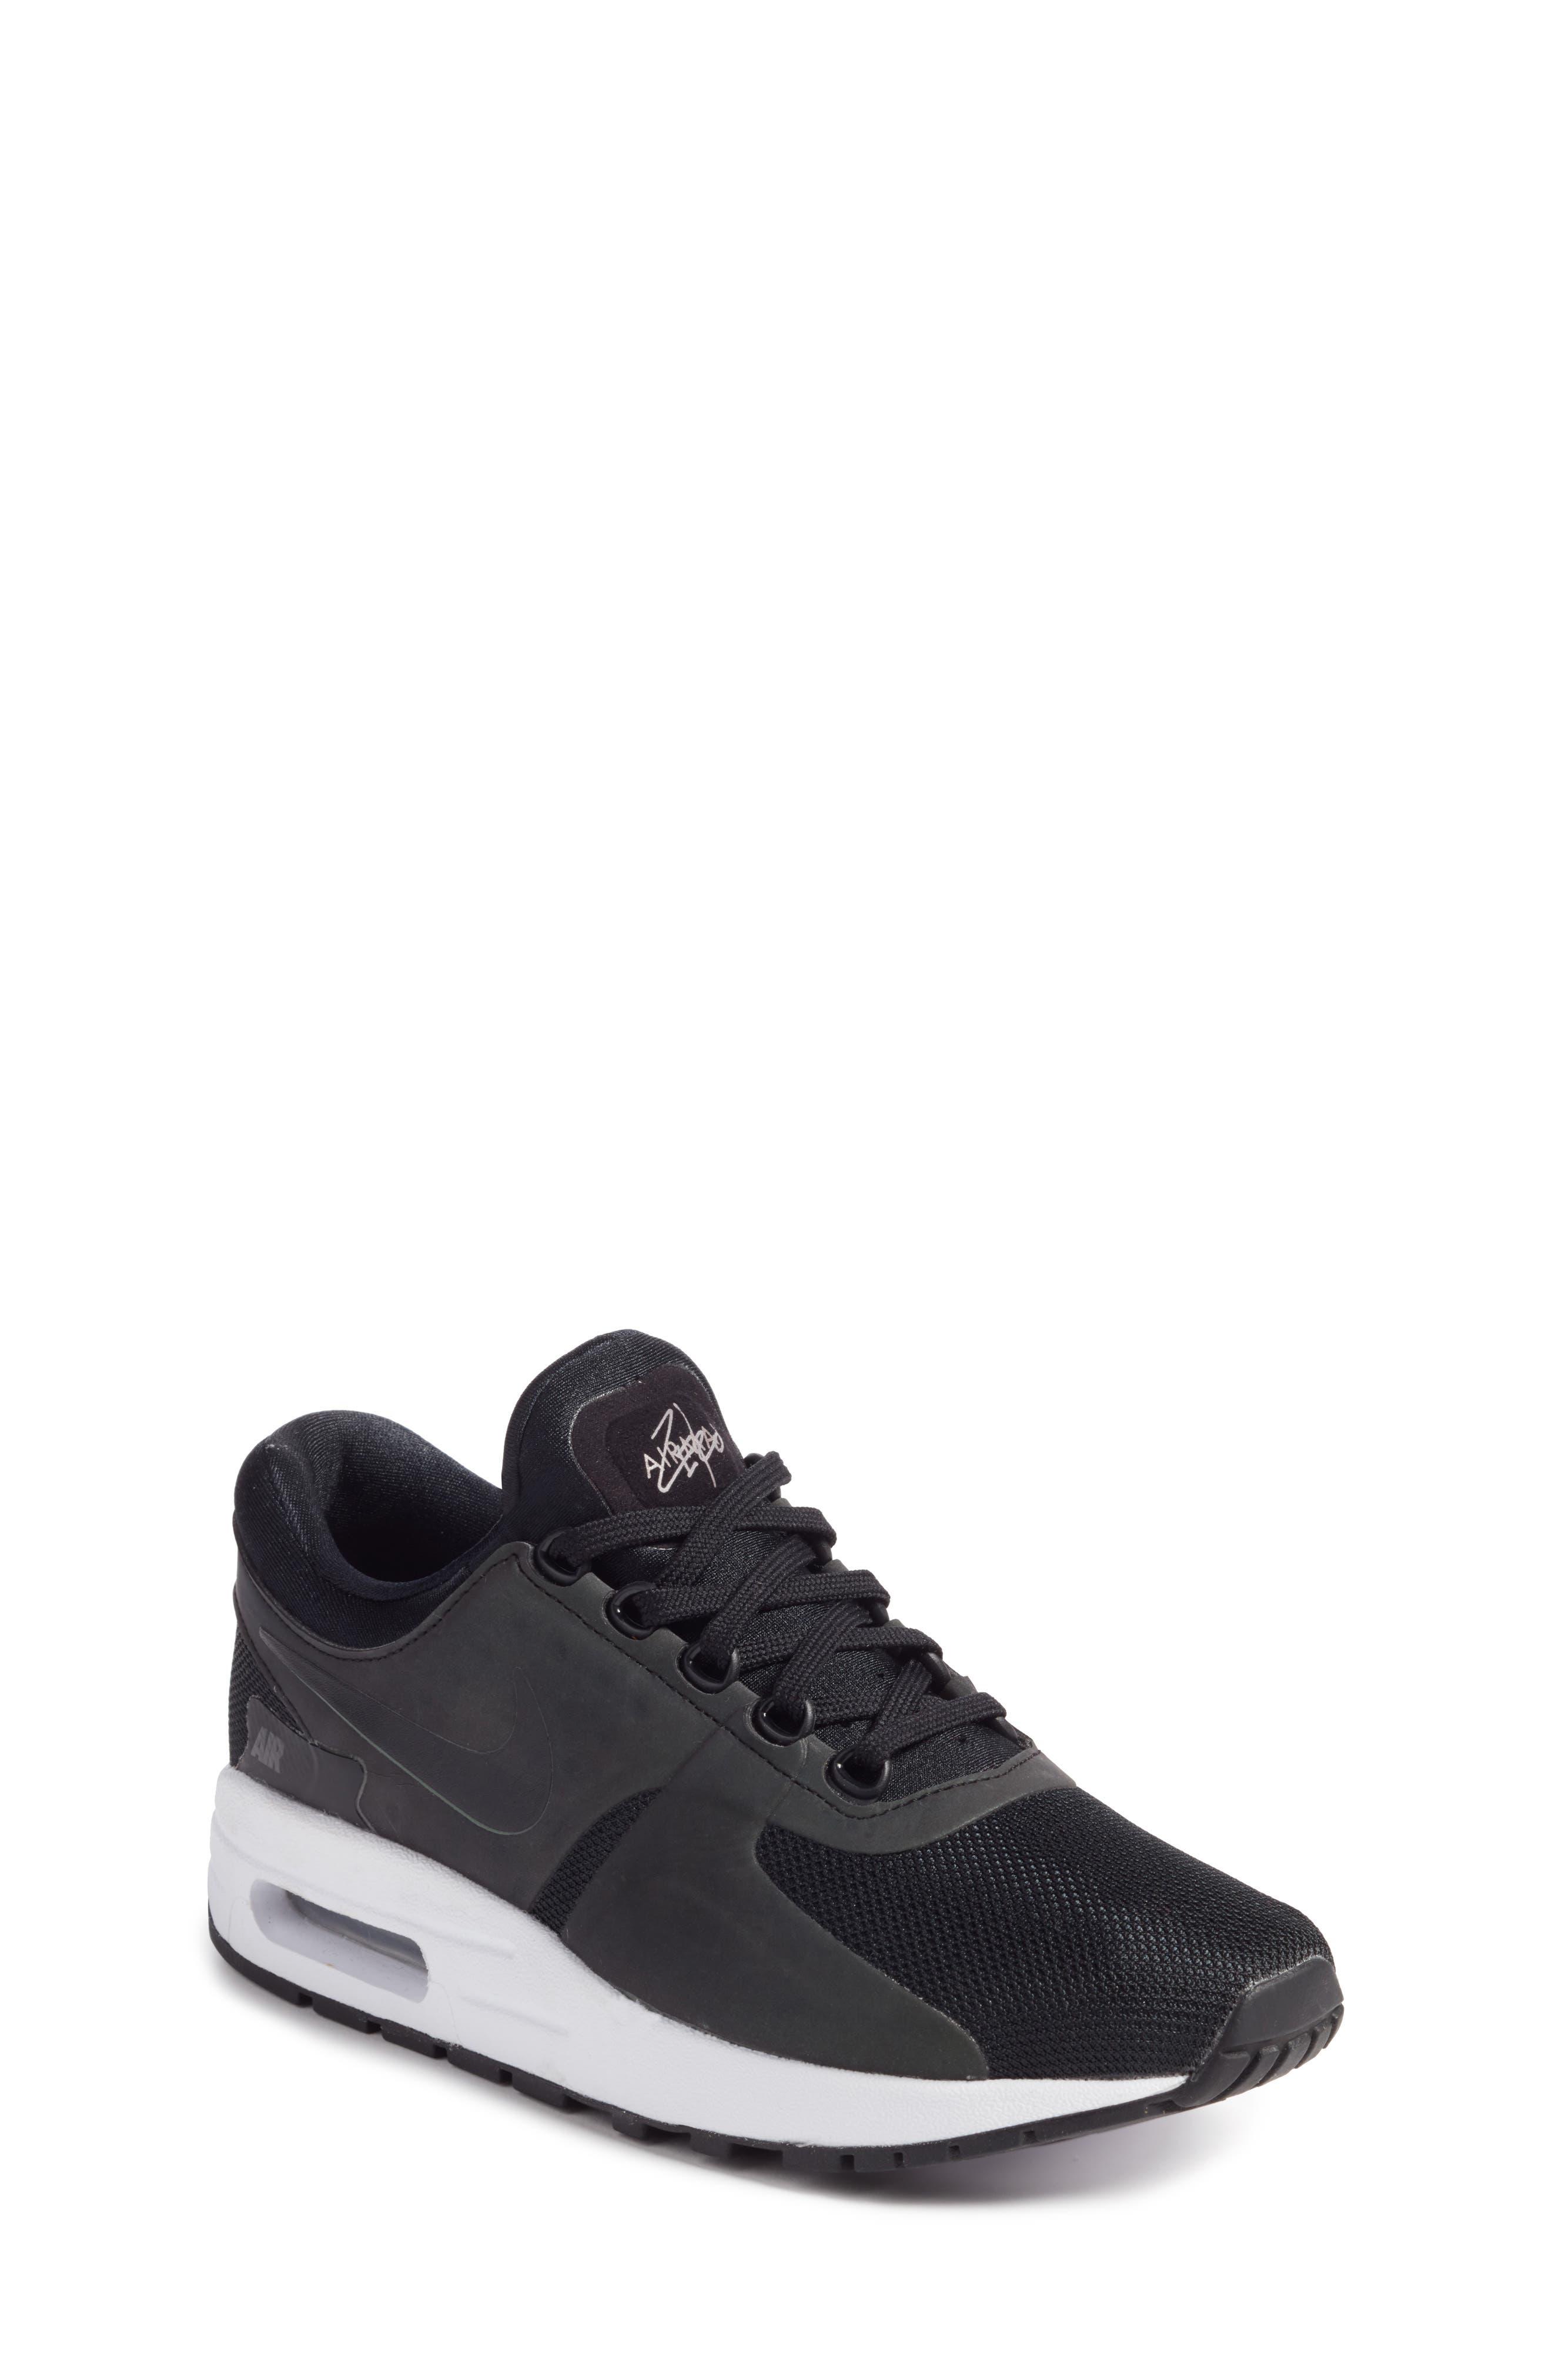 Air Max Zero Sneaker,                         Main,                         color,